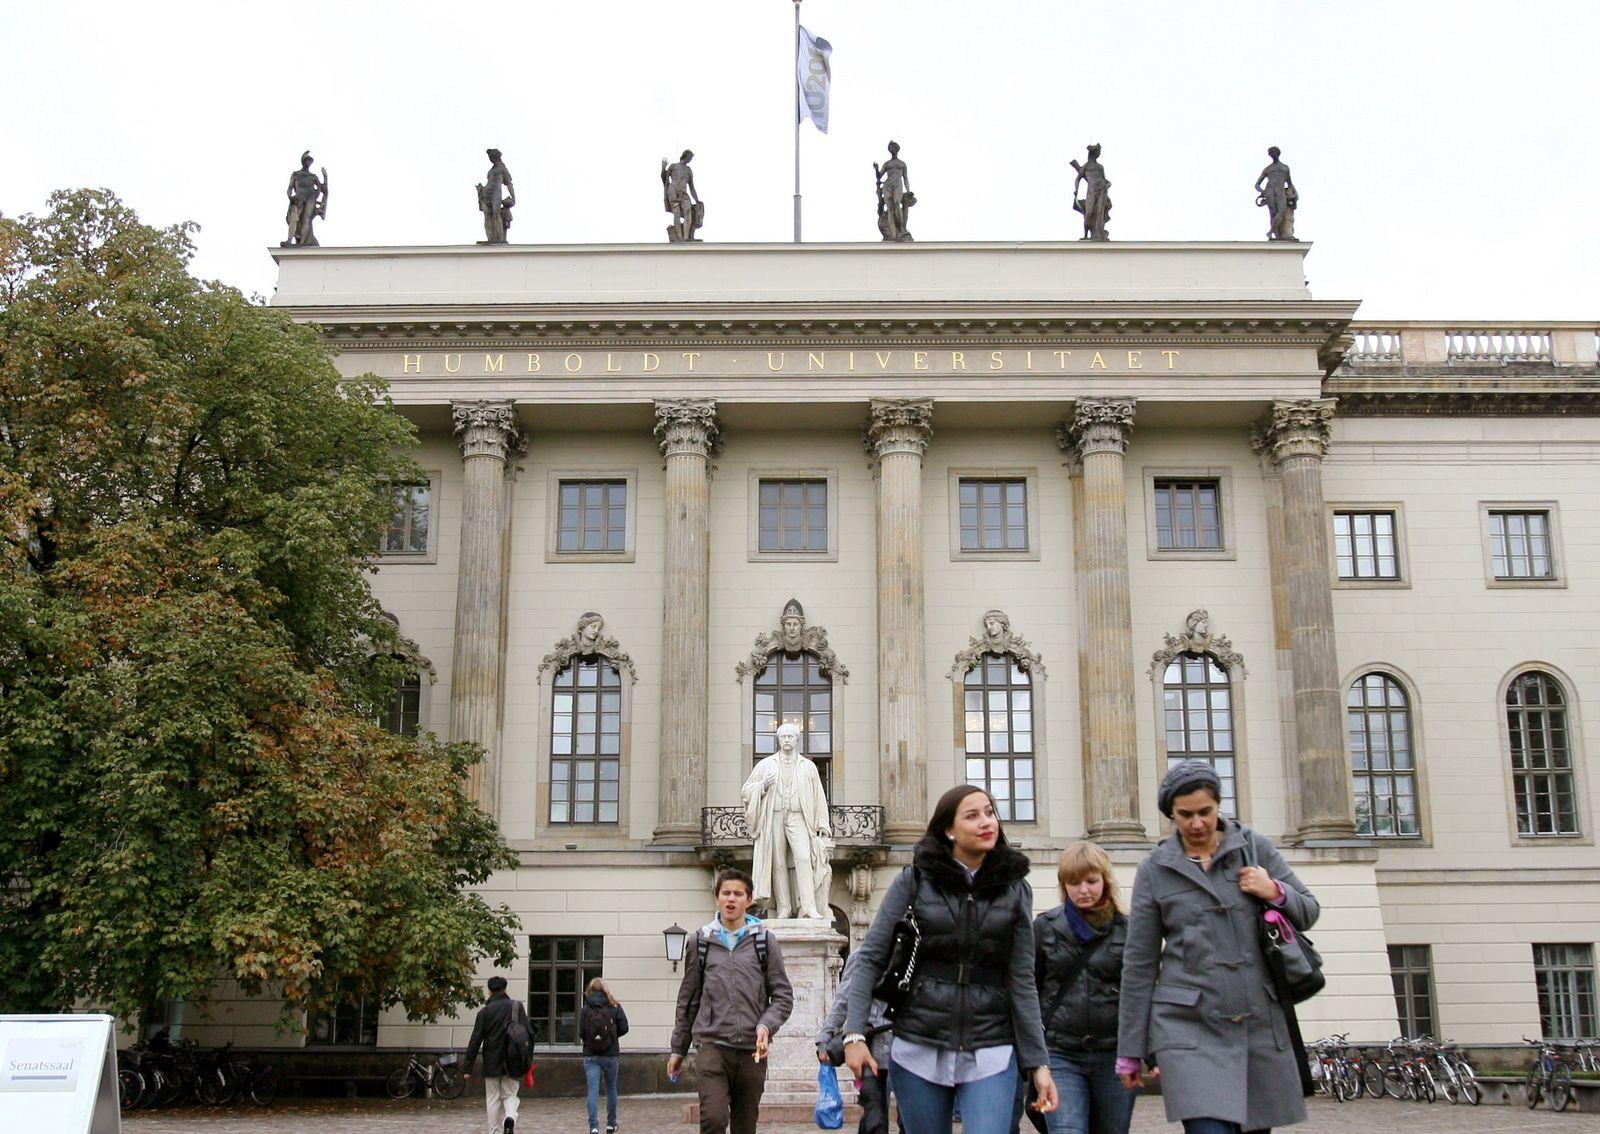 Humboldt-Universität / Berlin